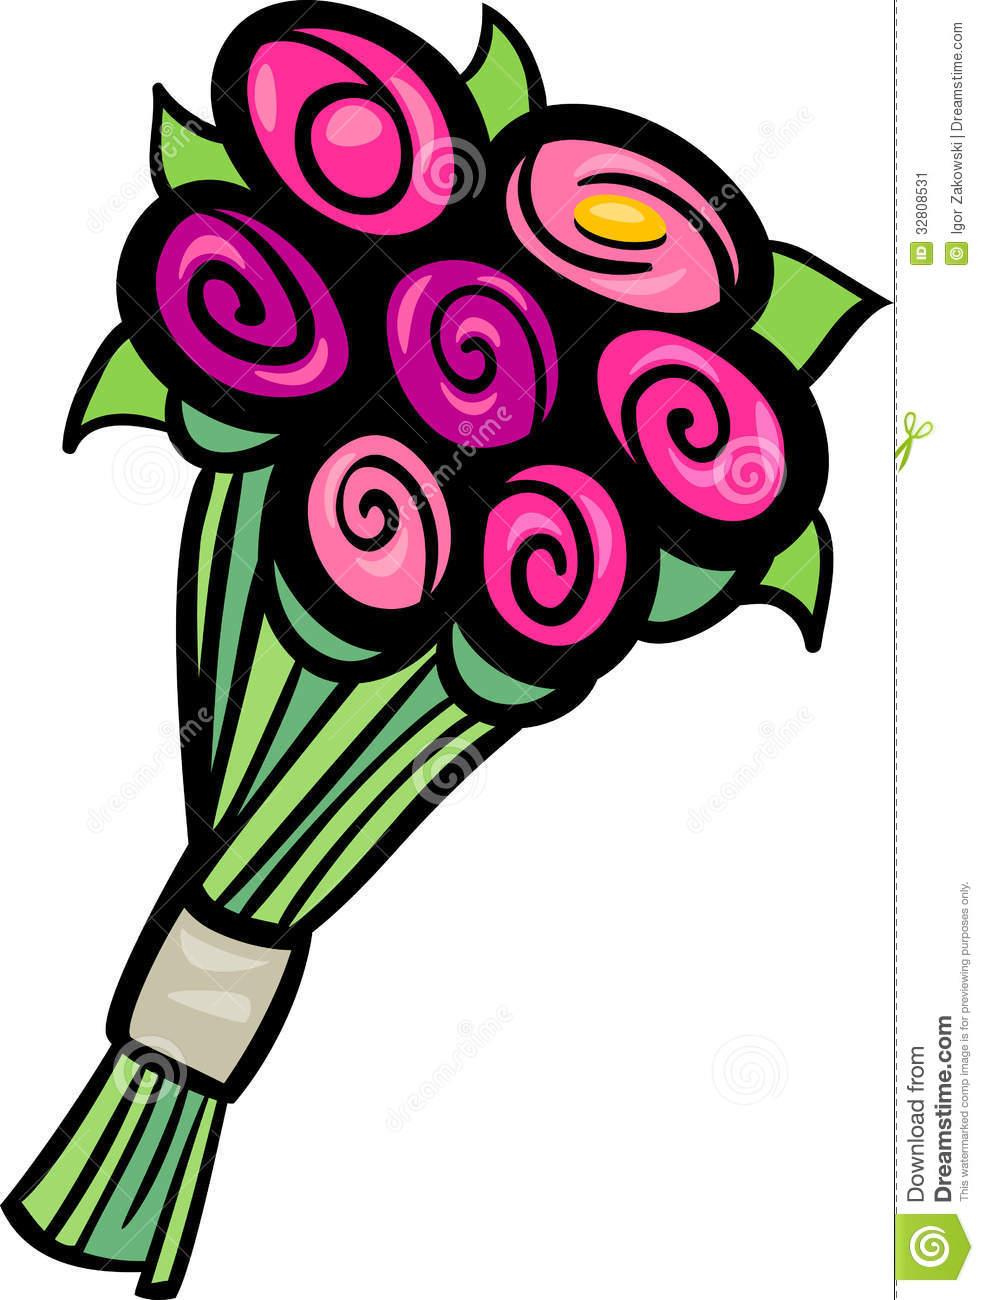 Black and white clipart. Clip art flowers bouquet